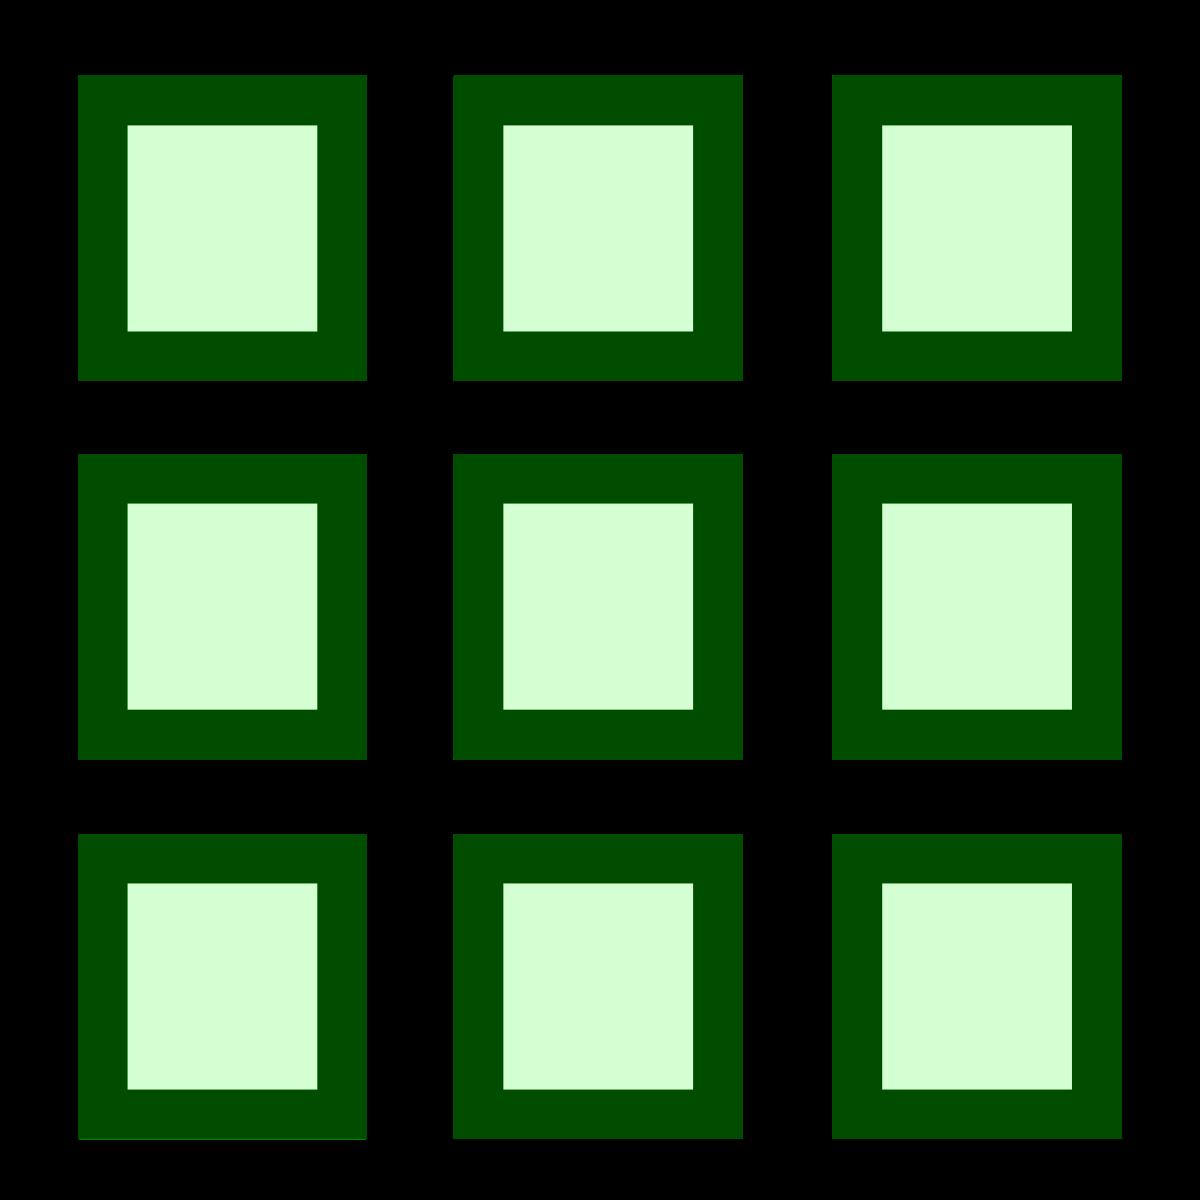 Quadratic Formula Clipart | Clipart Panda - Free Clipart ...  Quadratic Formu...